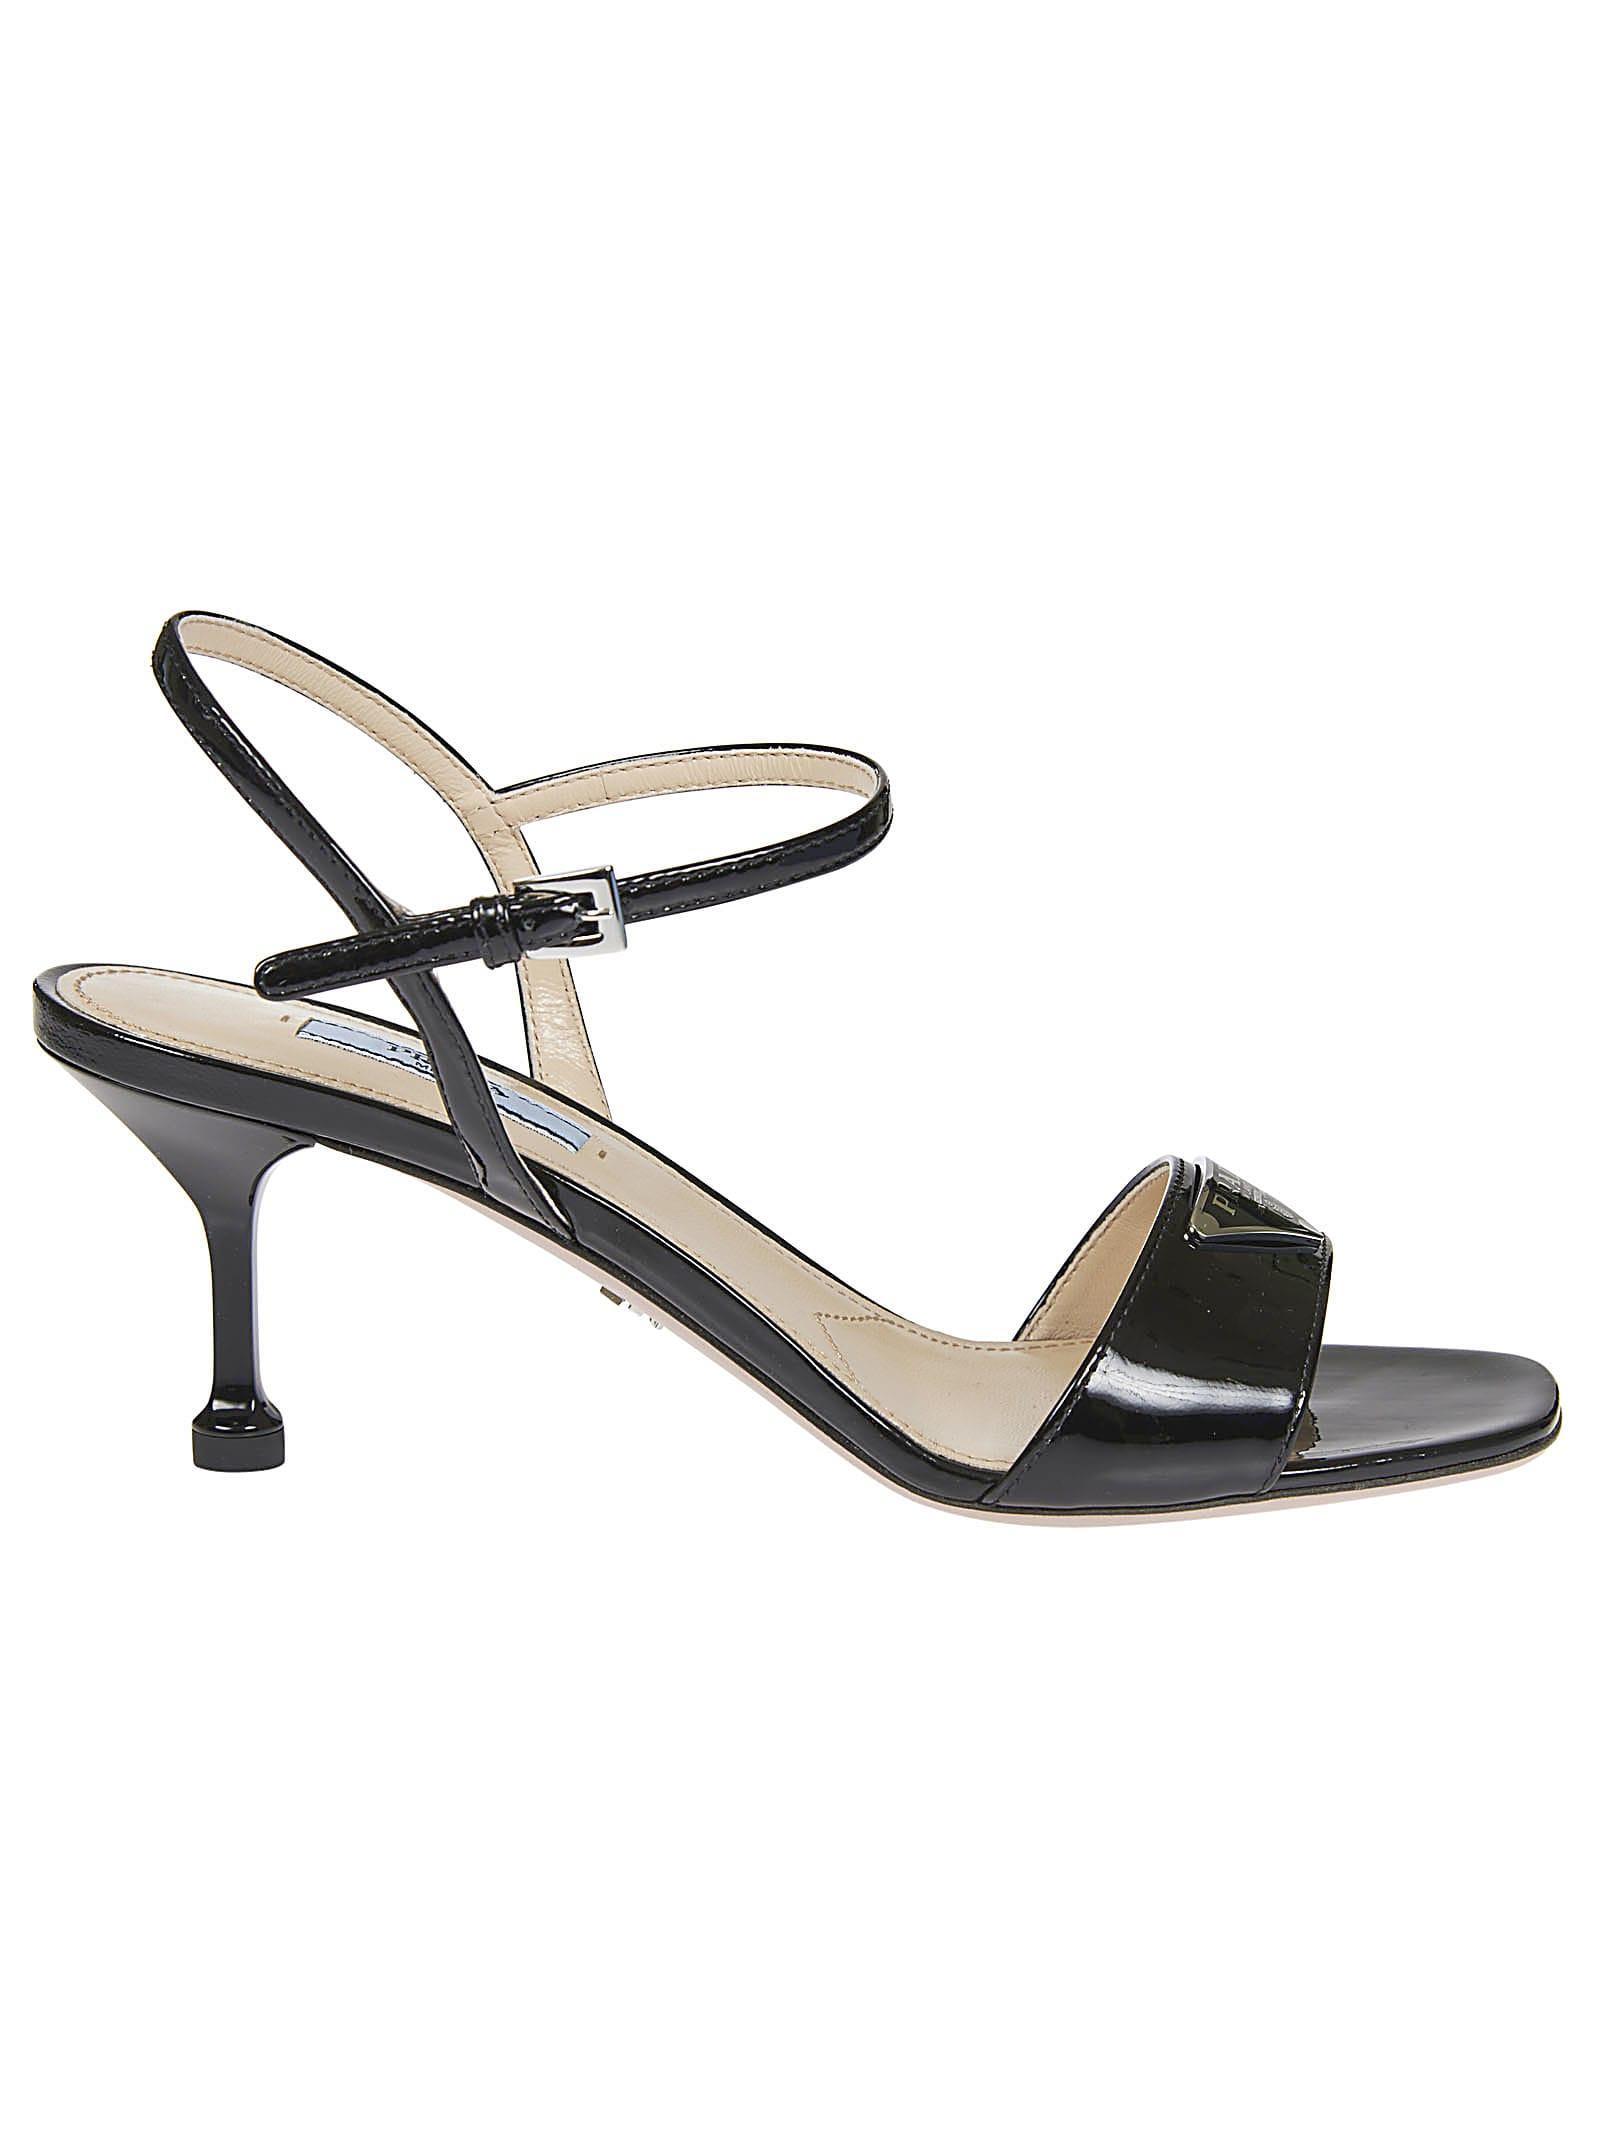 Buy Prada Vernice Sandals online, shop Prada shoes with free shipping